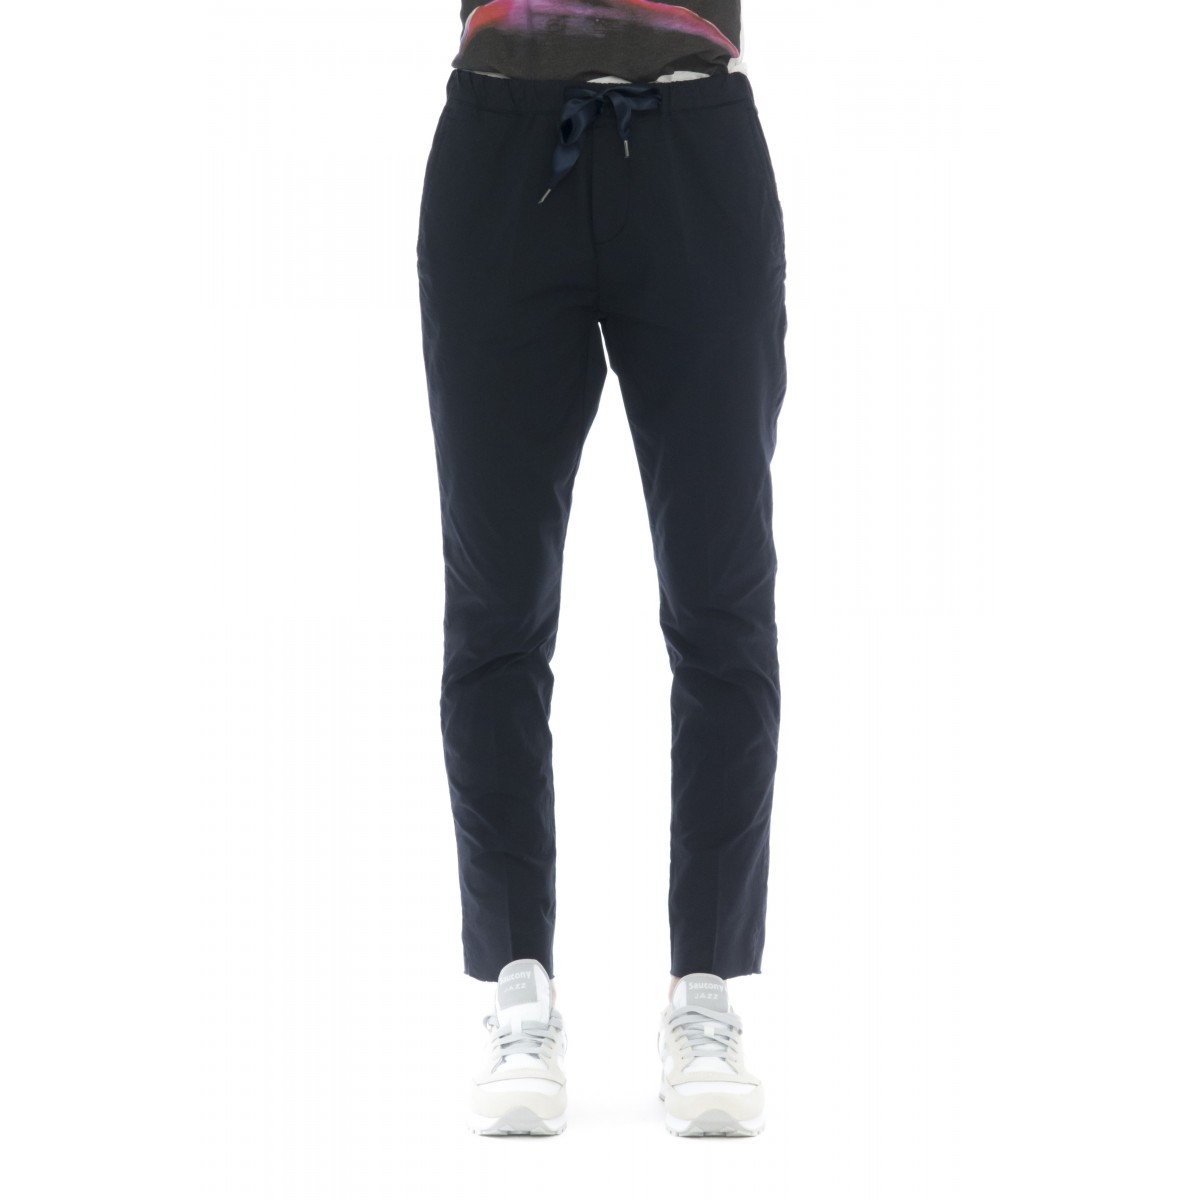 Pantalone donna - Emma 4210 popeline cotone coulisse